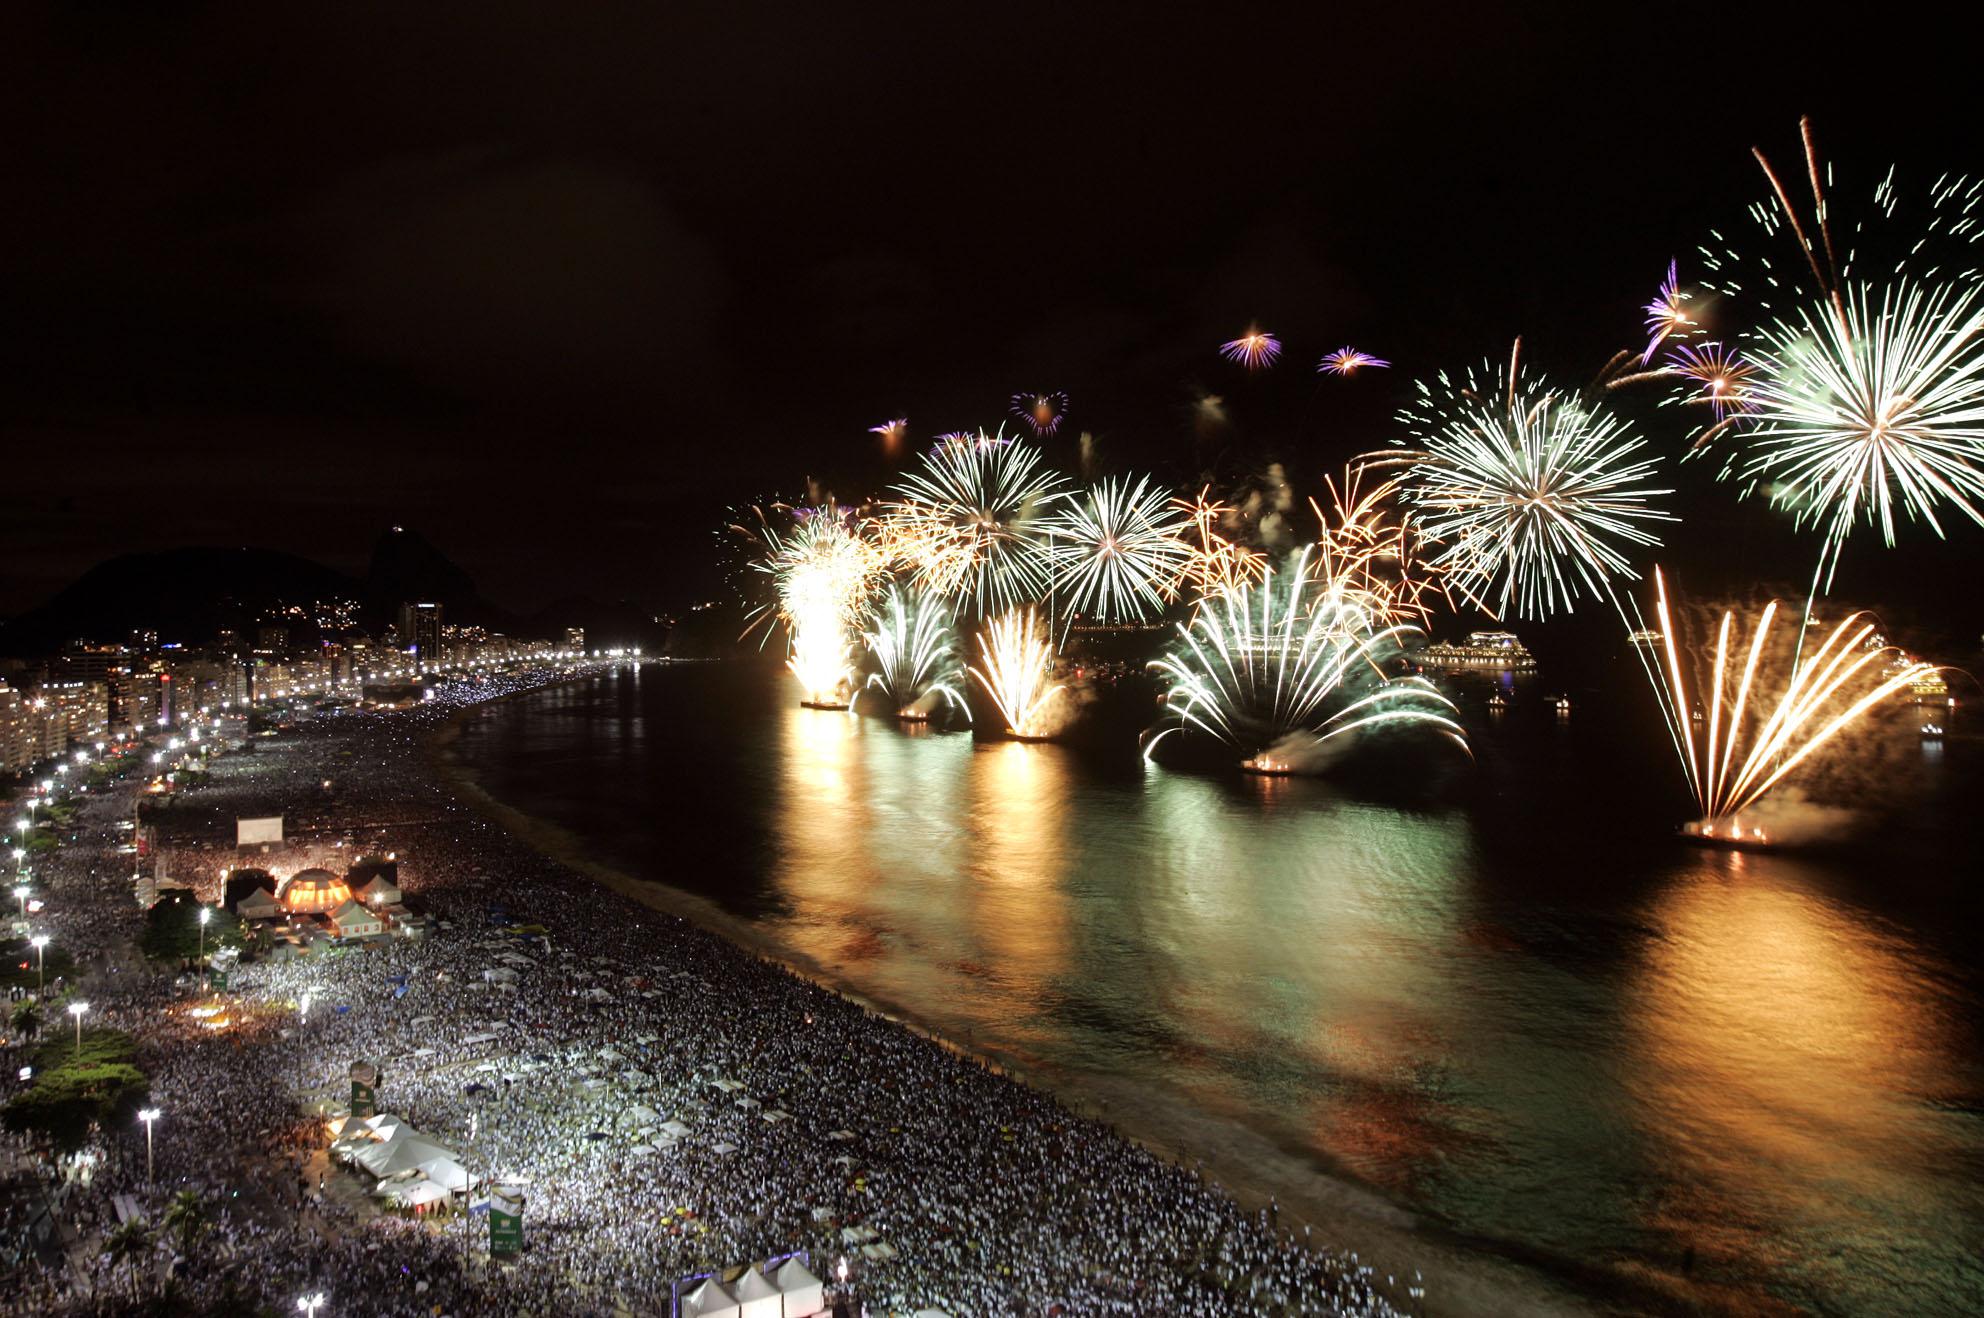 New Year's Eve in Rio de Janeiro